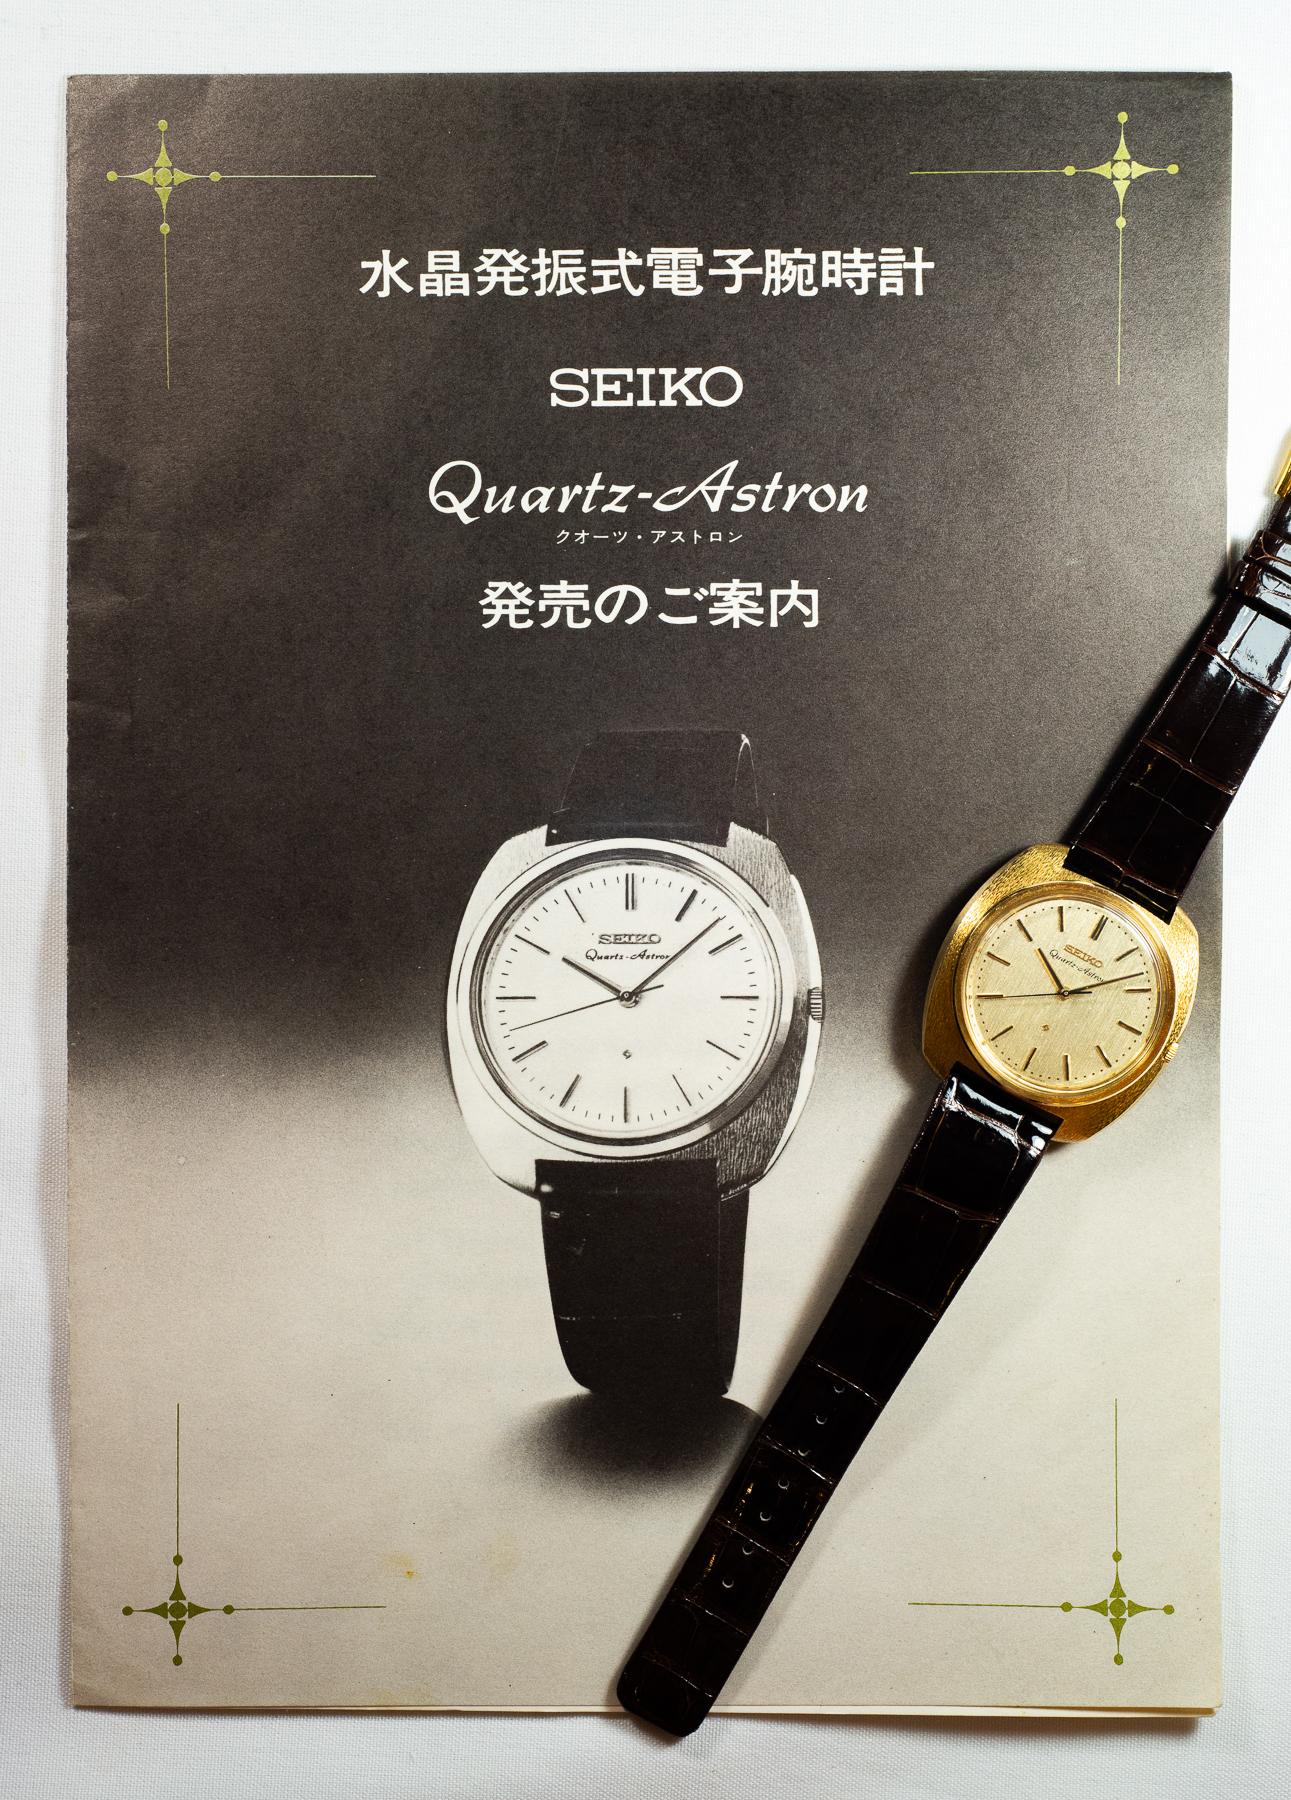 newest 21c4e bbad6 Seiko Quartz Astron - World's First Quartz Watch Promotional ...